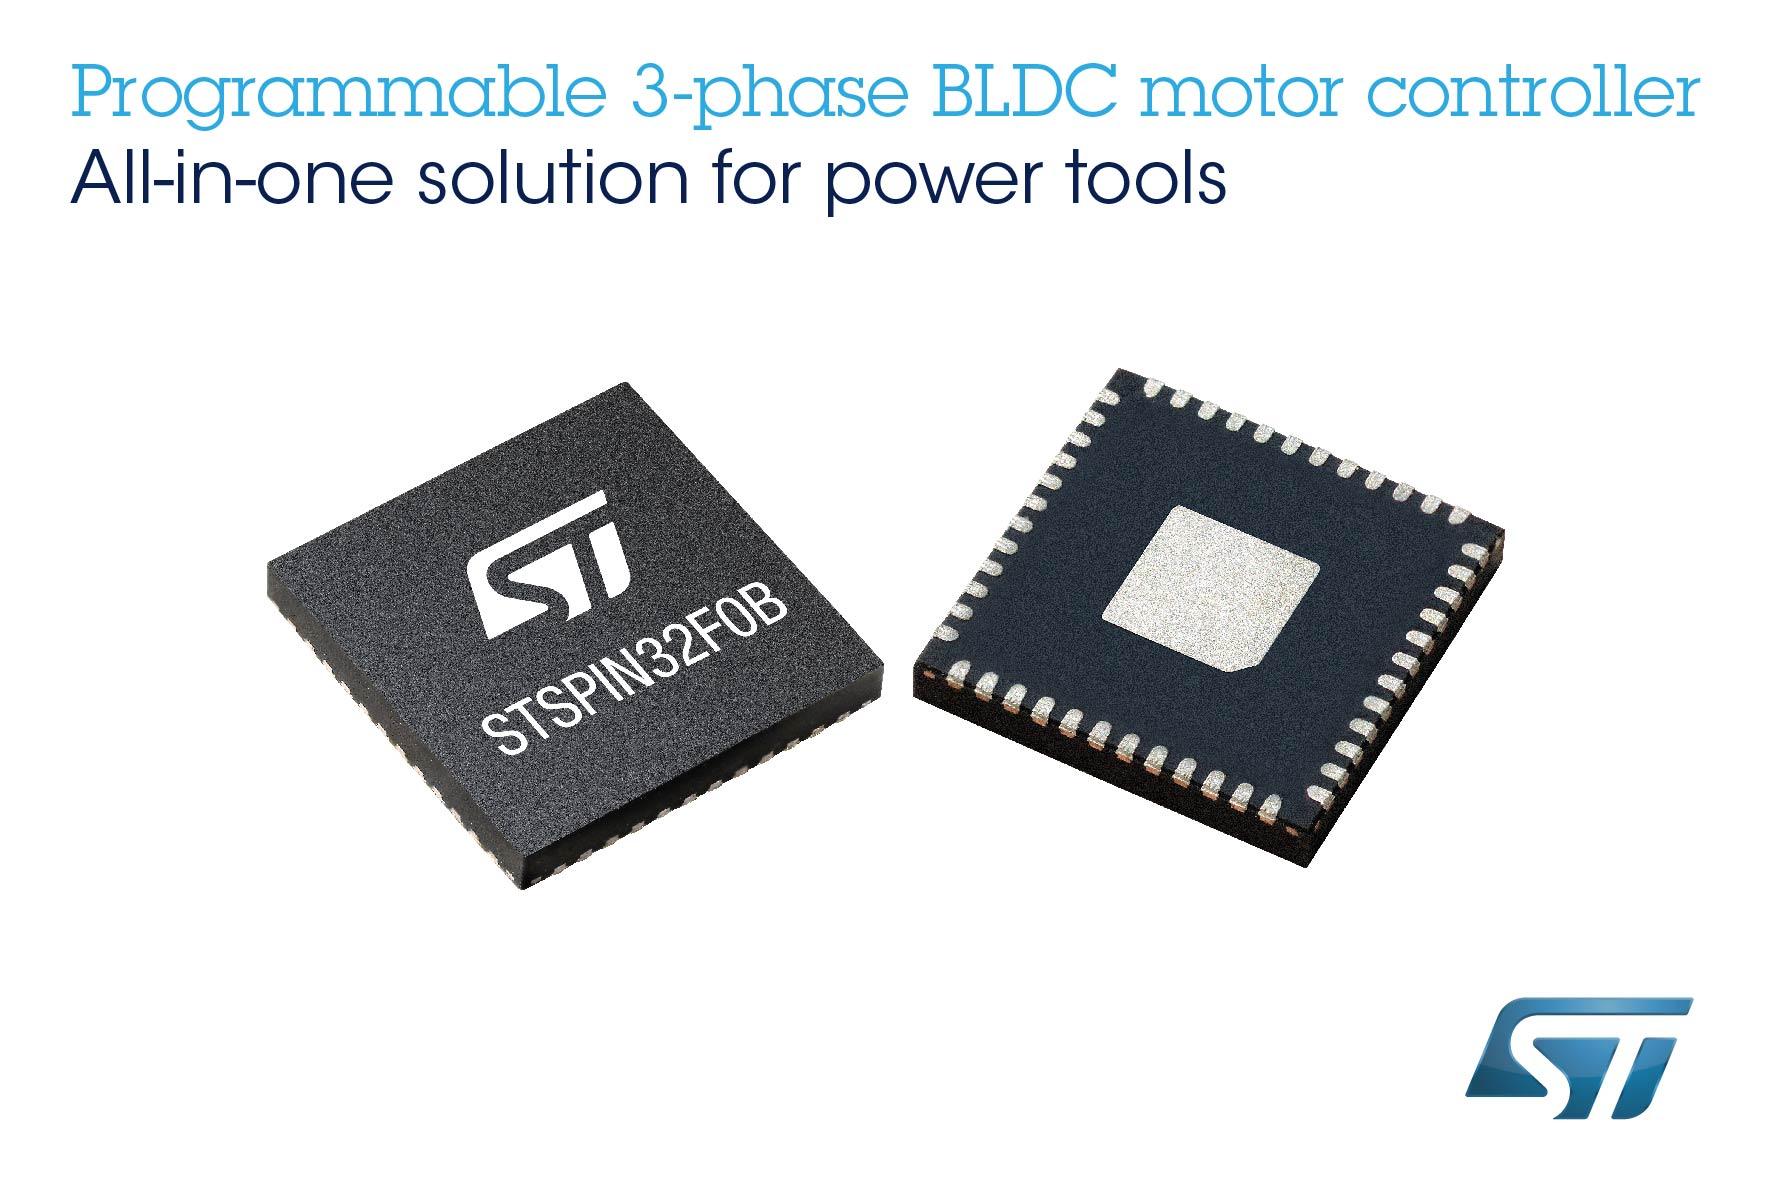 ST新闻稿5月7日——意法半导体STSPIN32单ShuntBLDC电机控制器可大量节省空间、时间和物料成本.jpg